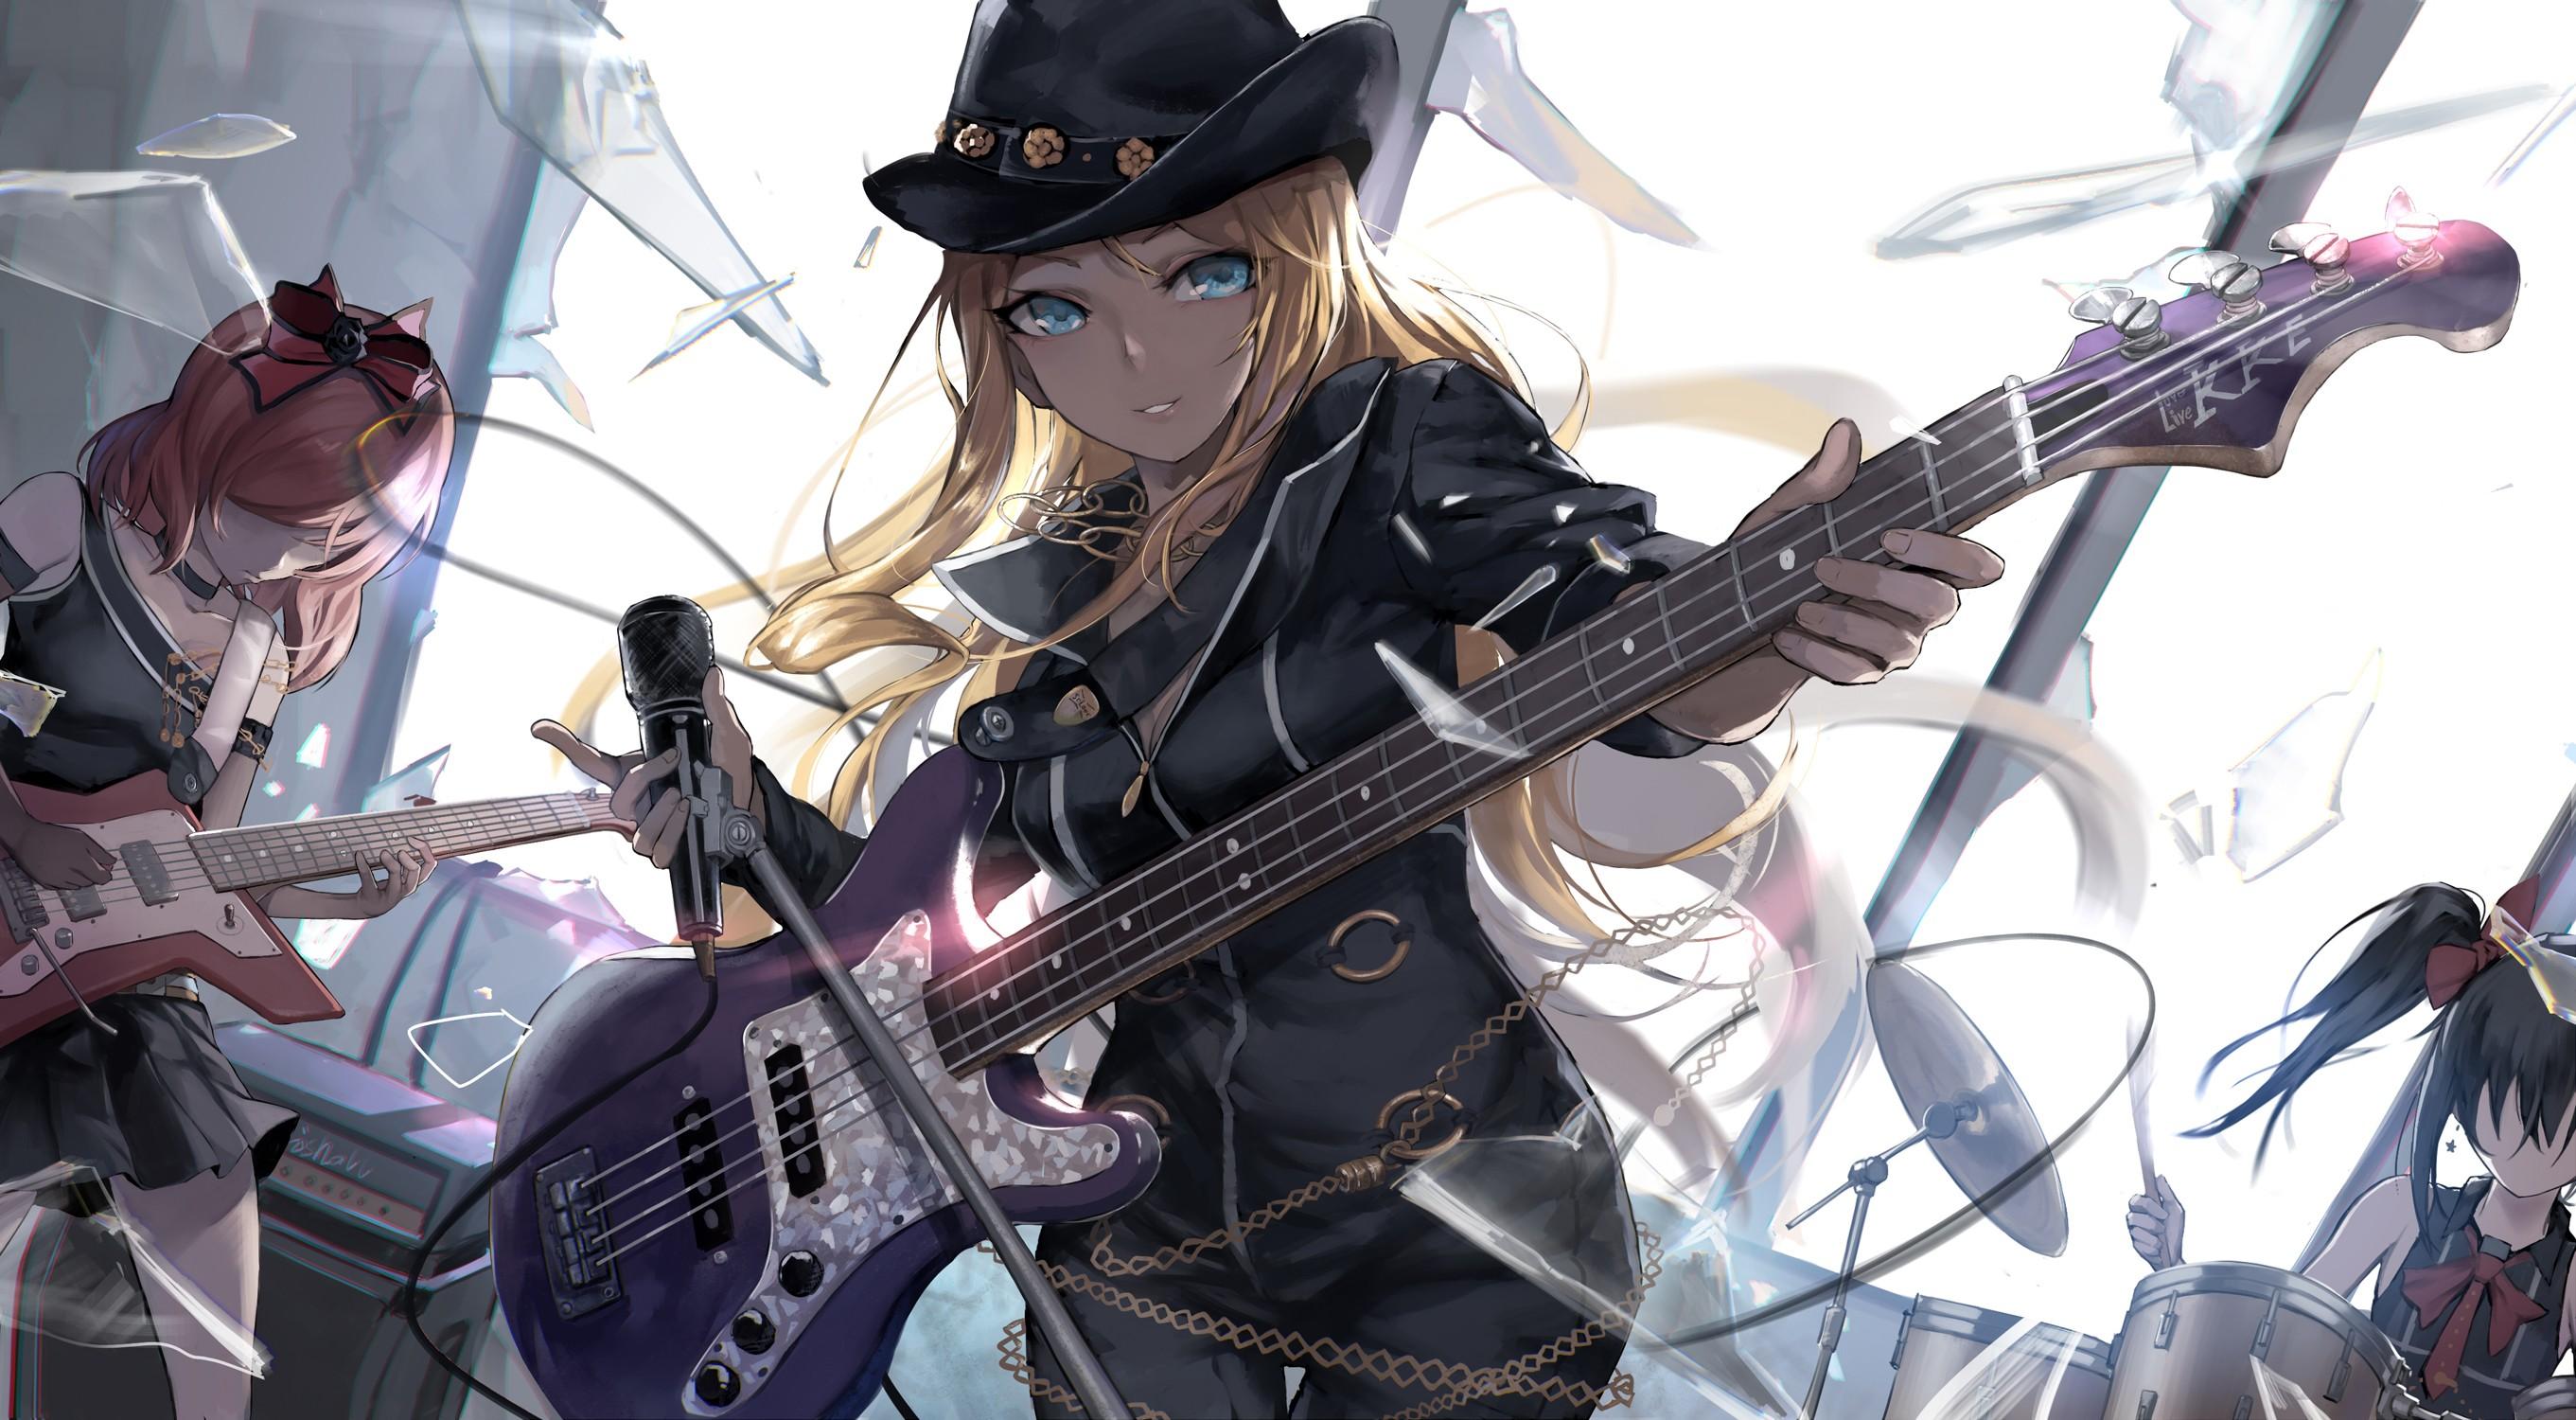 Wonderful Wallpaper Love Guitar - long-hair-anime-anime-girls-guitar-Love-Live-Yazawa-Nico-bodysuit-Nishikino-Maki-machine-comics-Person-Ayase-Eli-screenshot-mecha-profession-61123  Pictures_70210.jpg